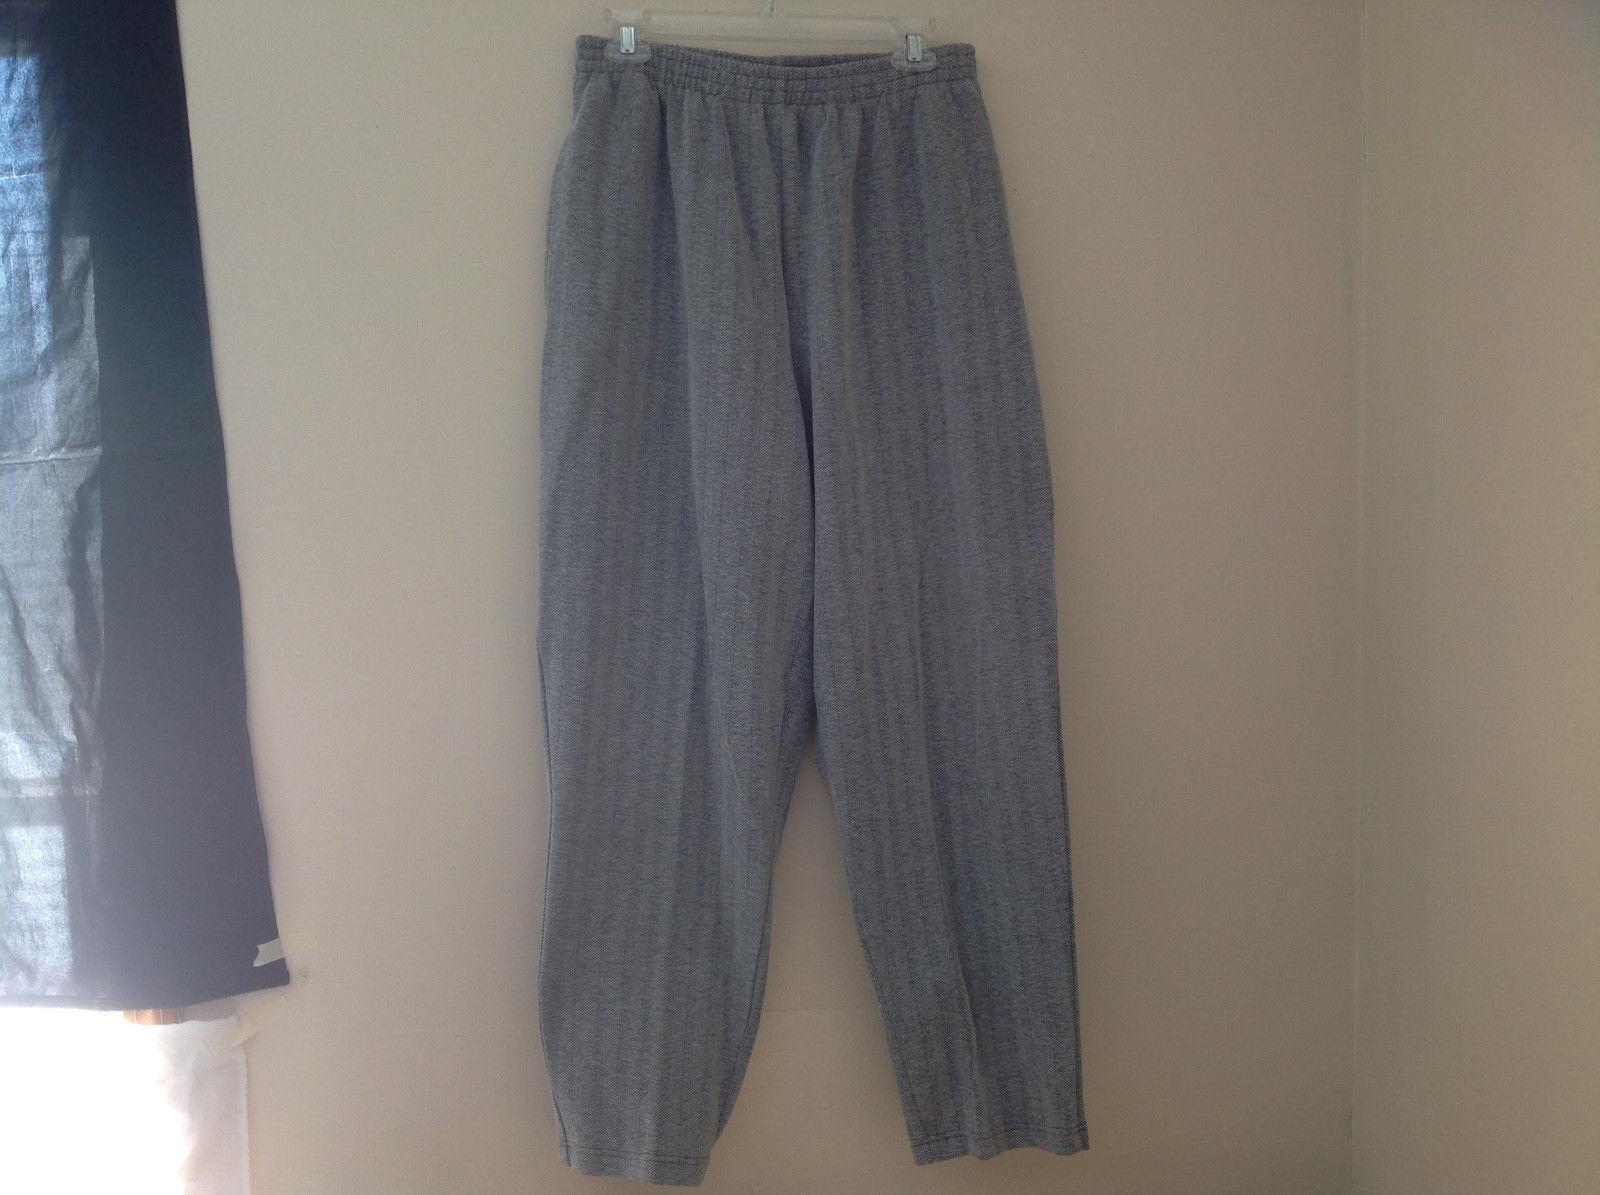 White Gray Black 2 Pocket Herringbone Pant Sweat Pant Material Elisa Beth Size 1